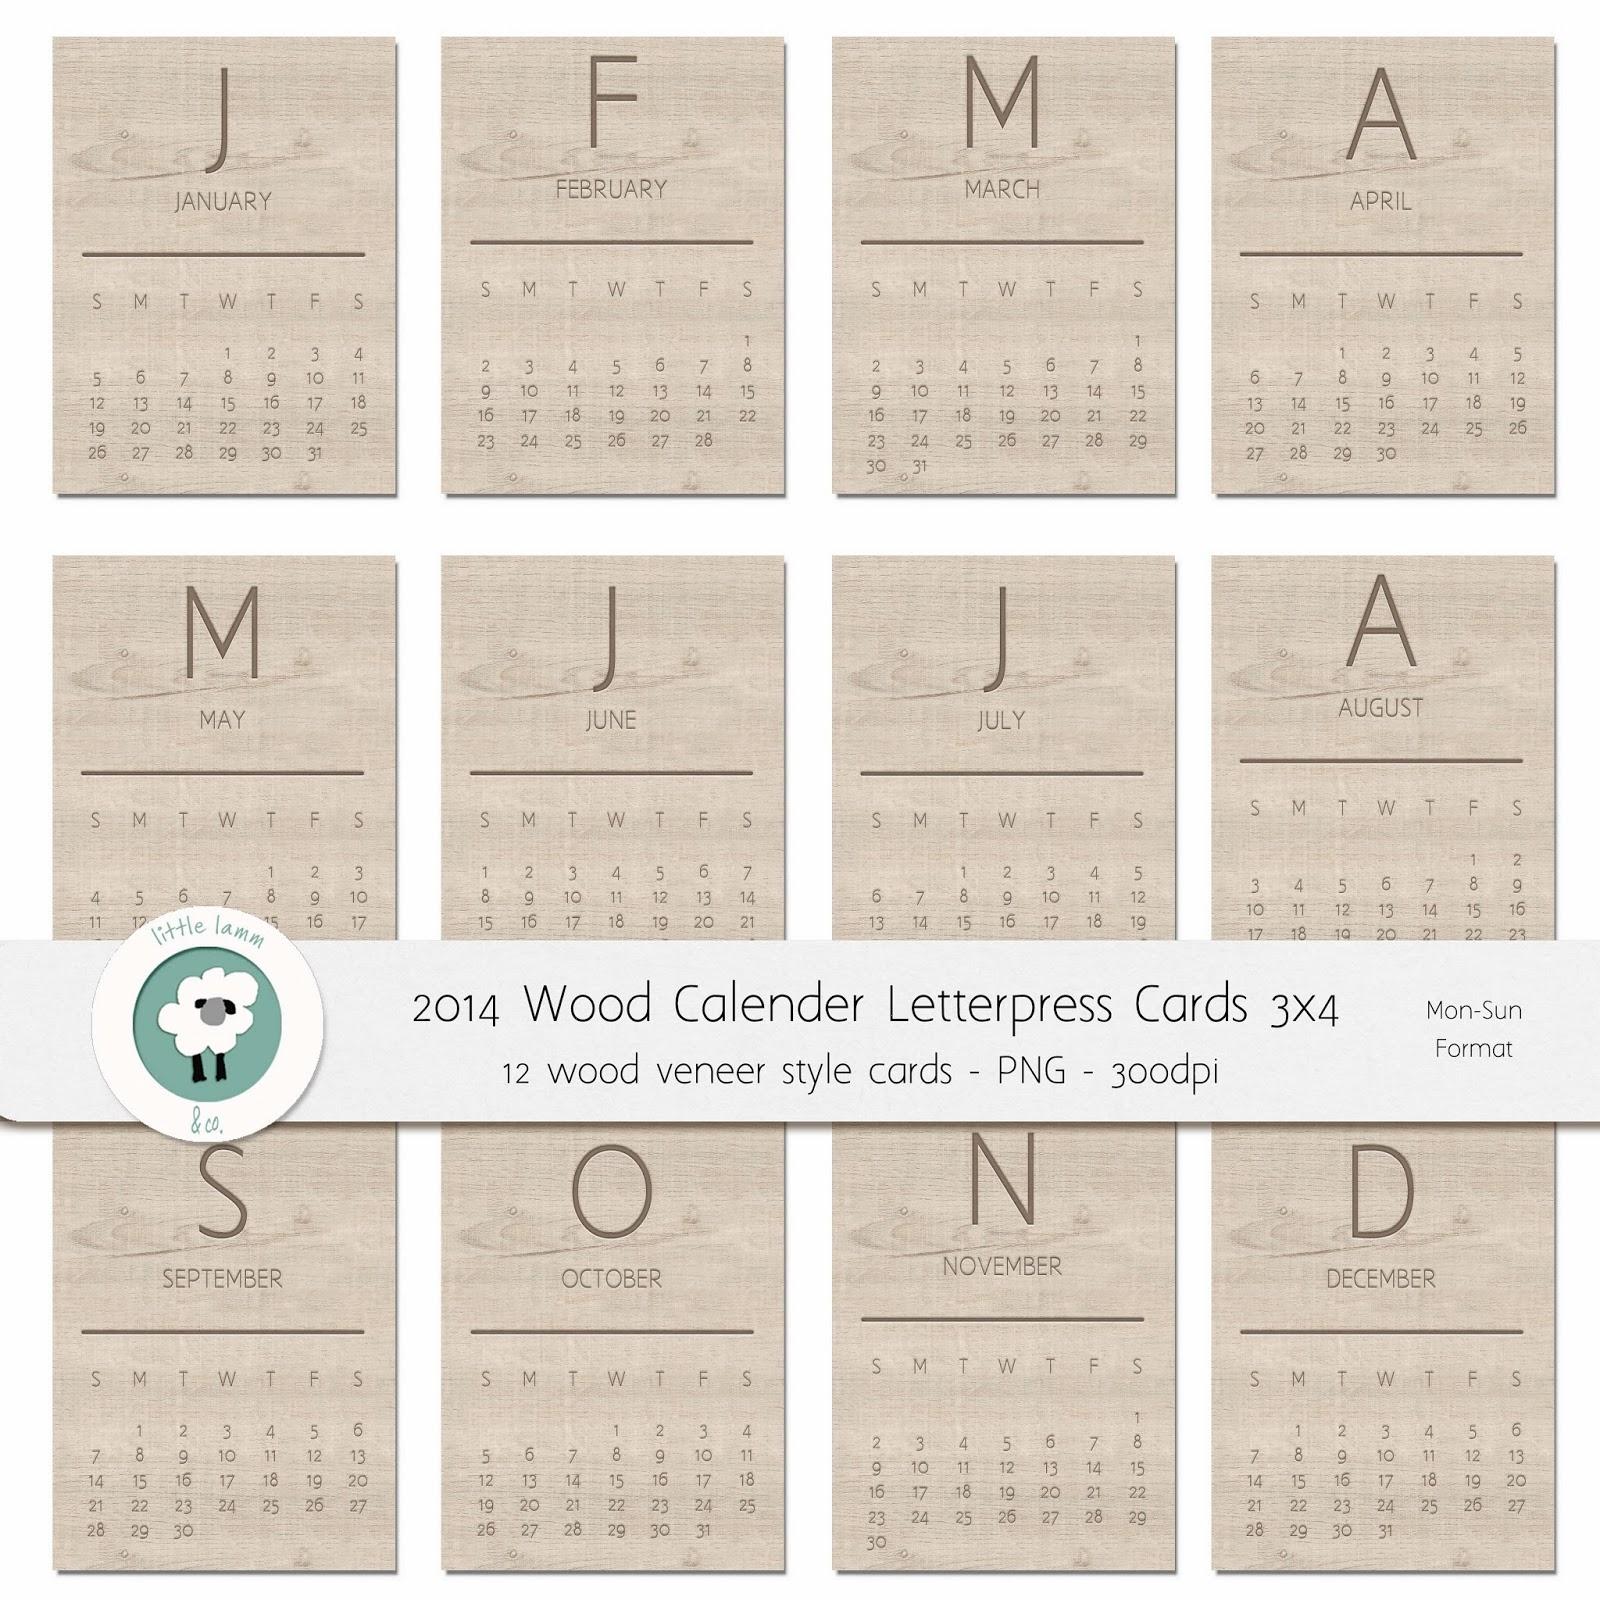 http://www.etsy.com/listing/165660903/little-lamm-co-digital-2014-wood-veneer?ref=shop_home_active_3